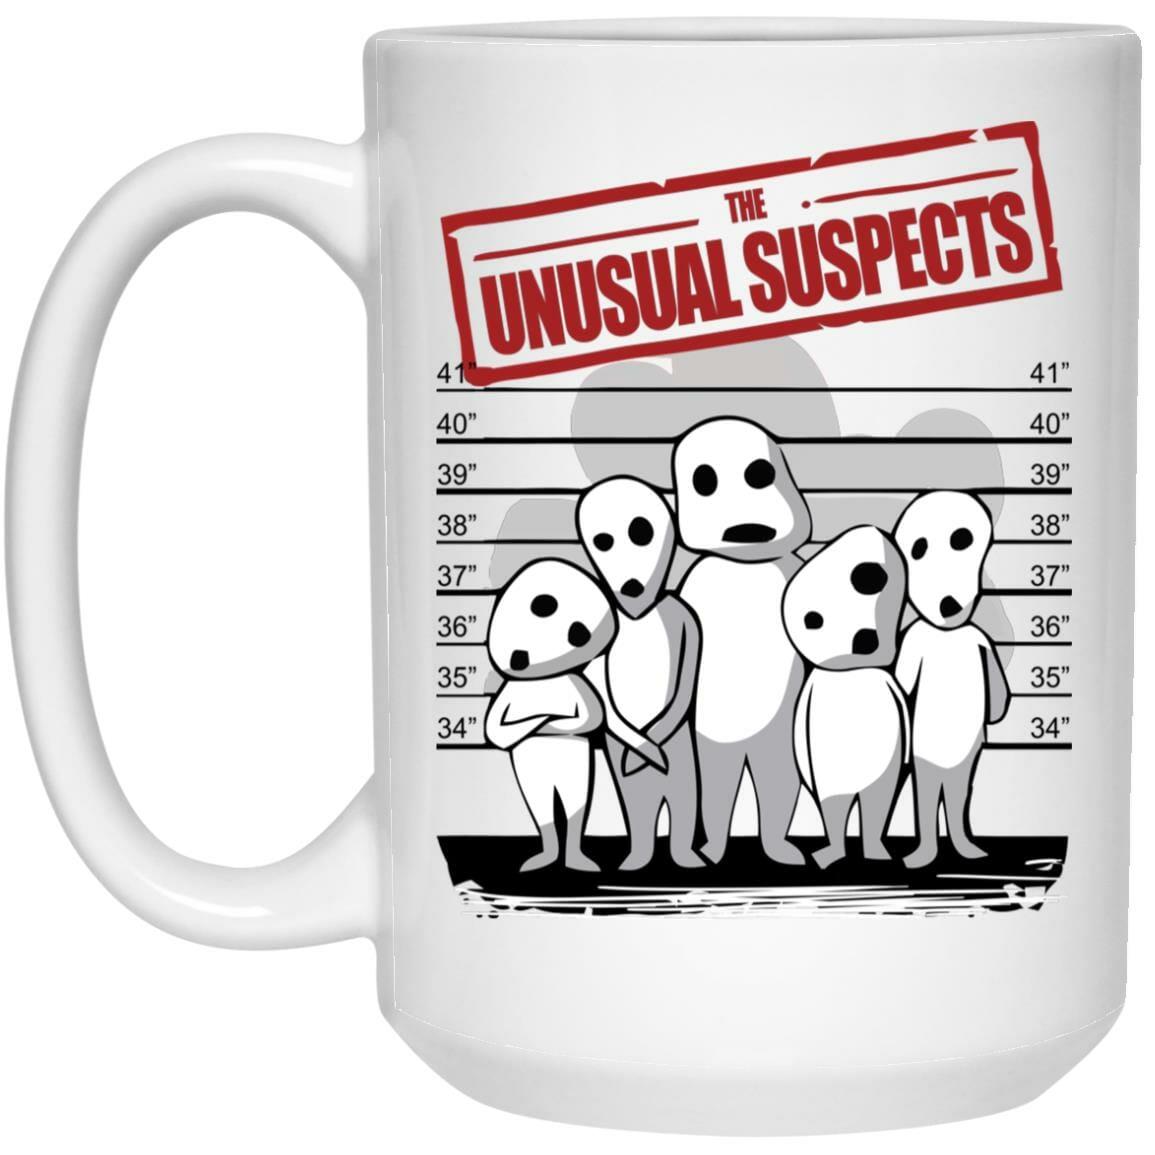 Princess Mononoke – Unusual Suspects Mug